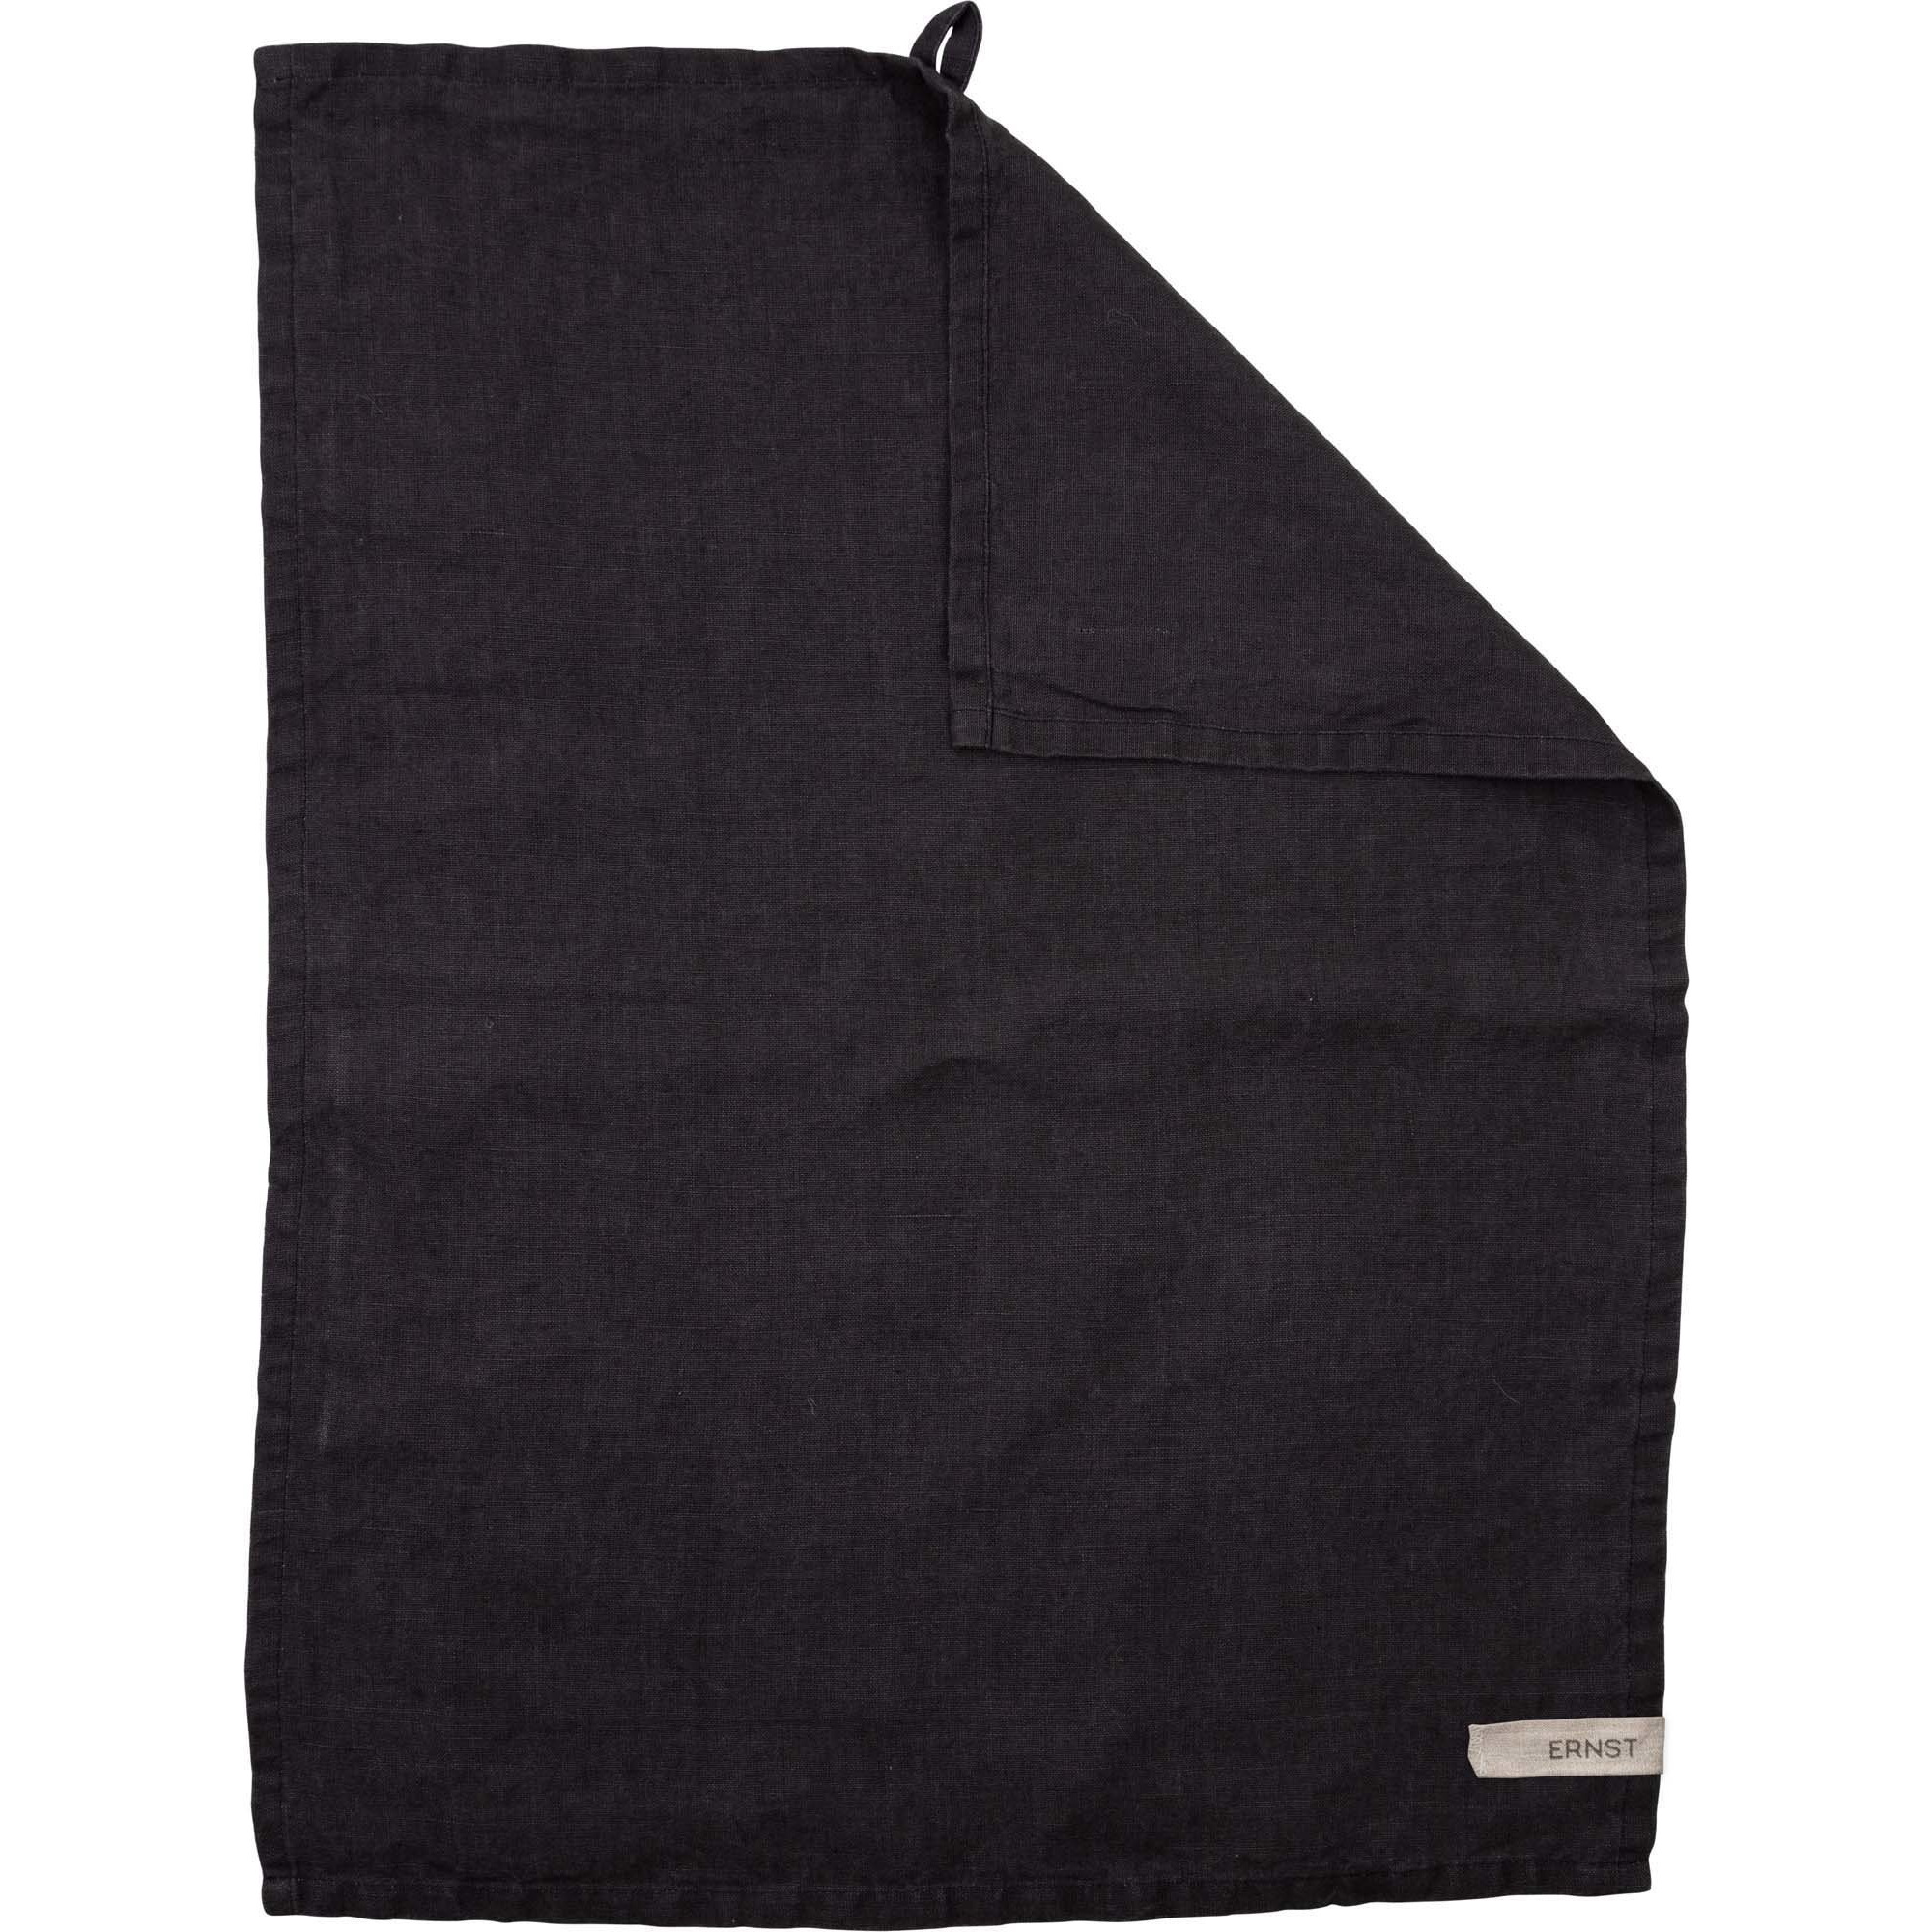 Ernst Kökshandduk linne 47×70 mörkgrå